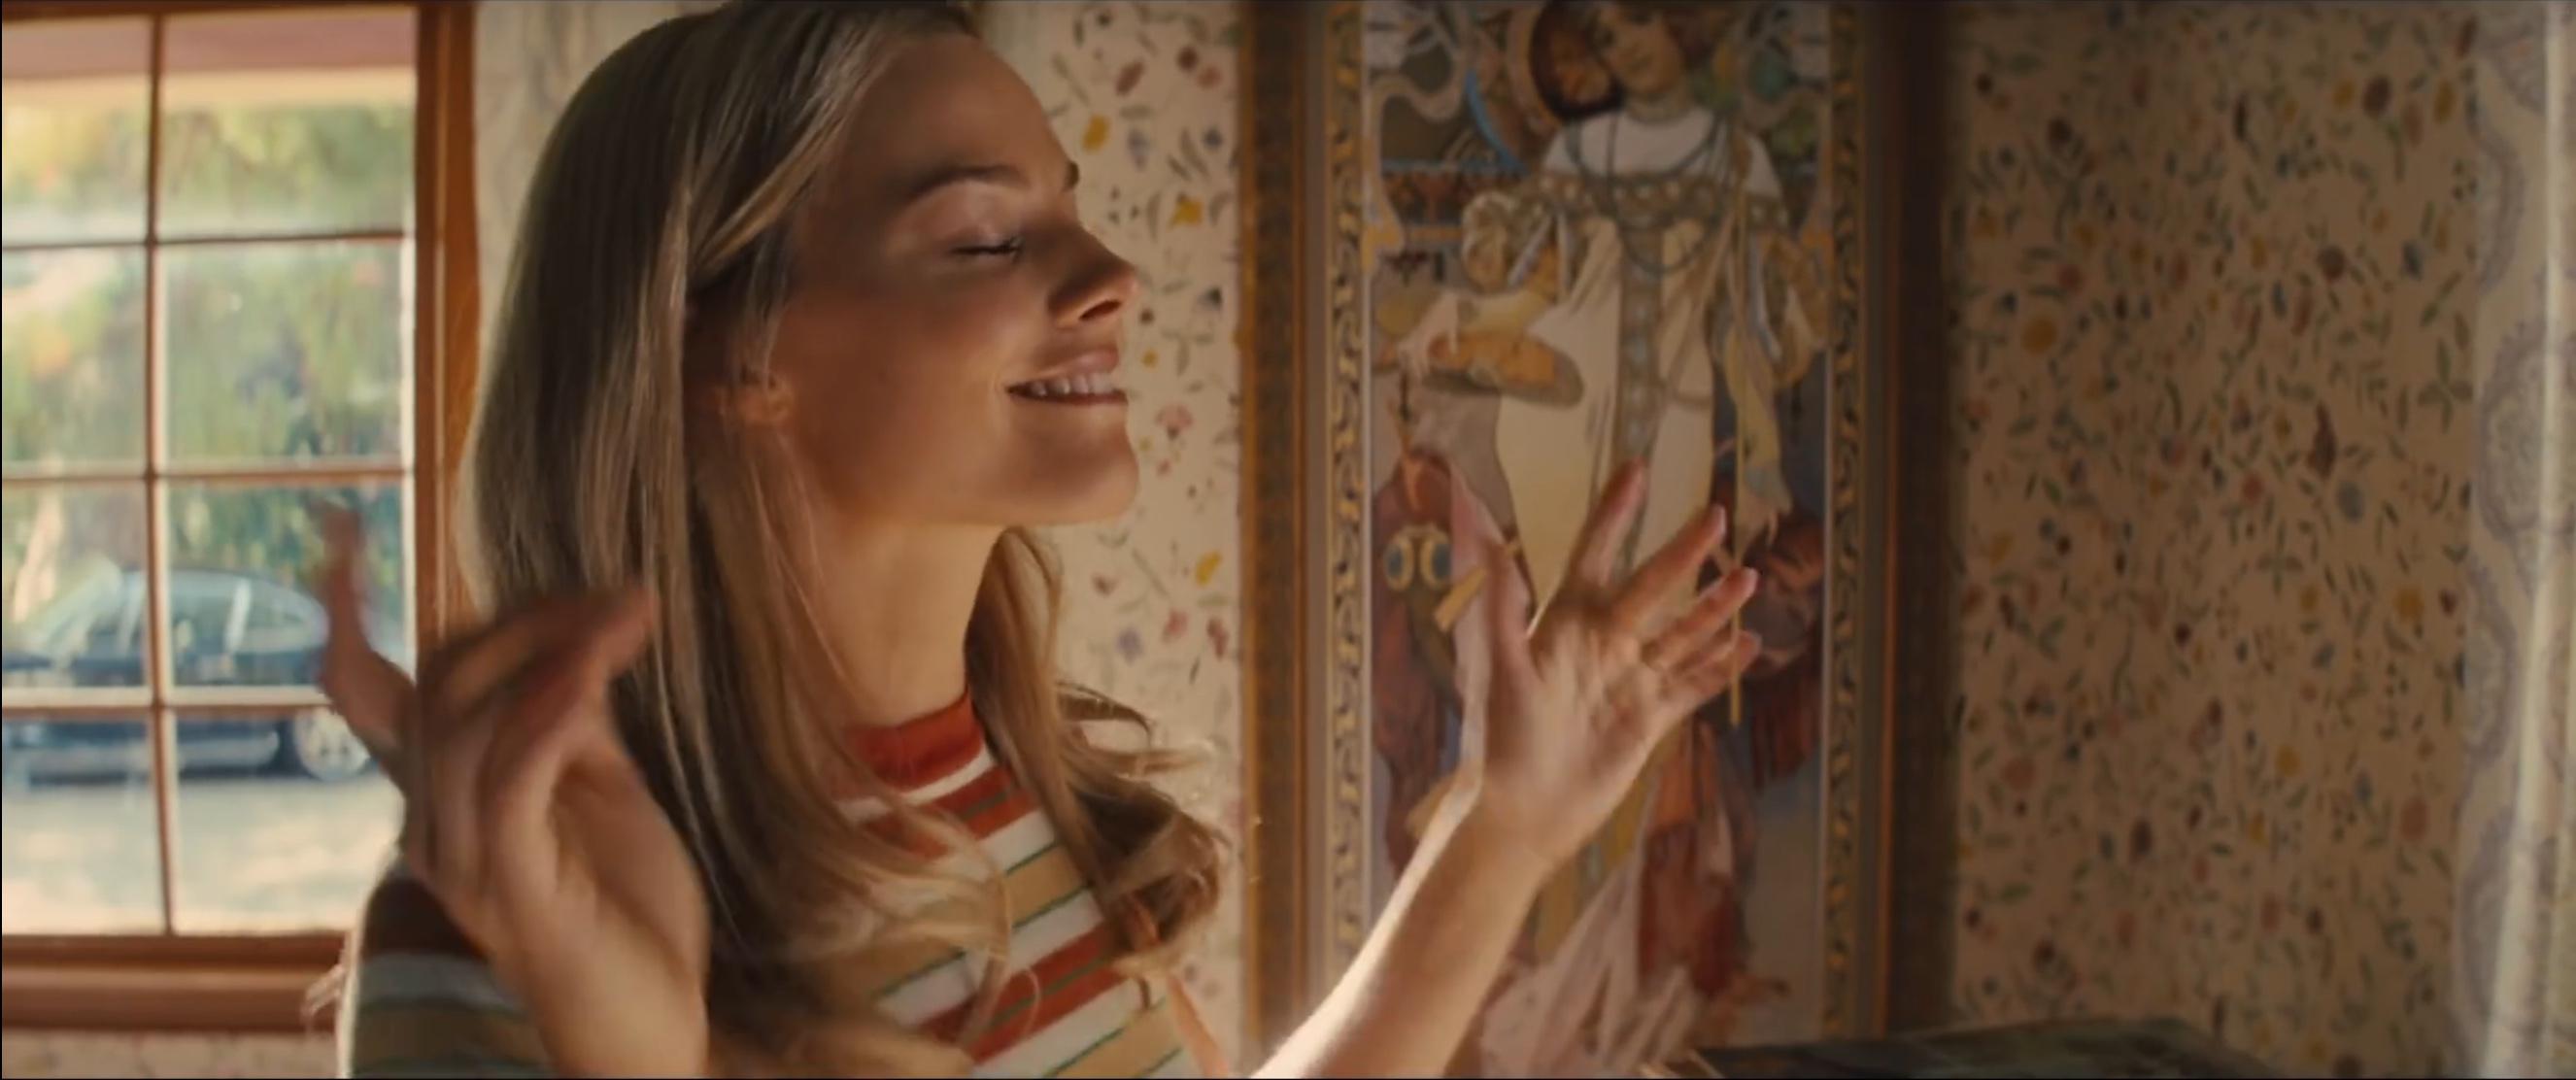 C'era una volta a... Hollywood: Margot Robbie in  un'immagine del teaser trailer